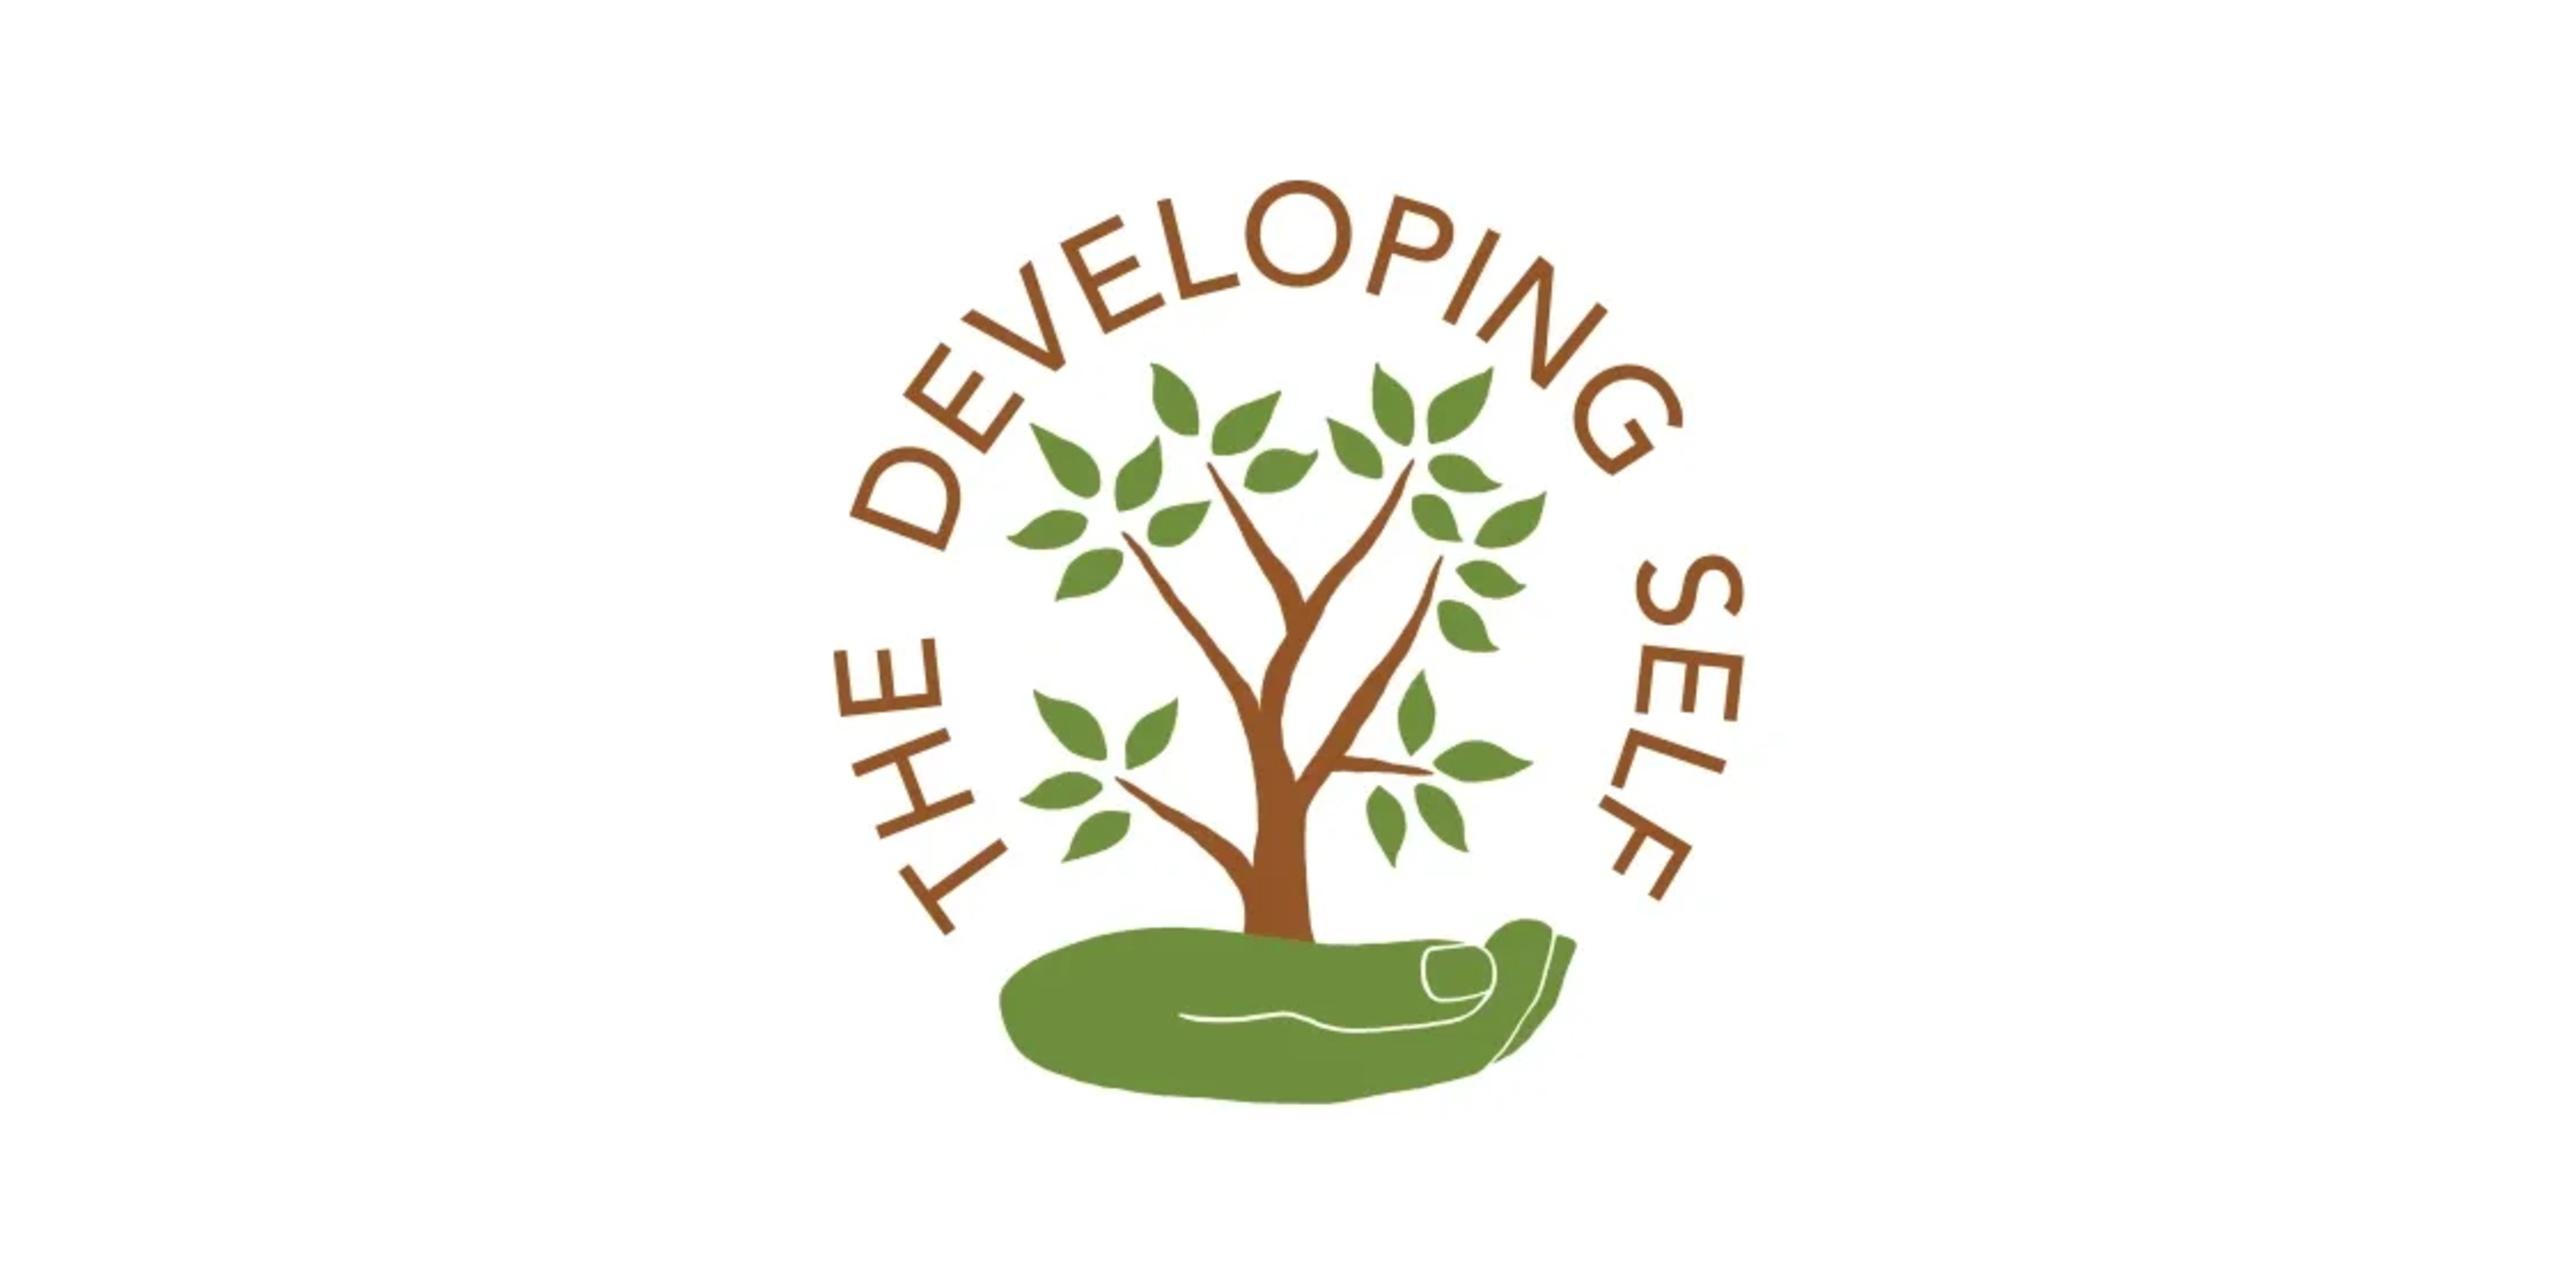 Alexander Technique for children: the 'Developing Self'